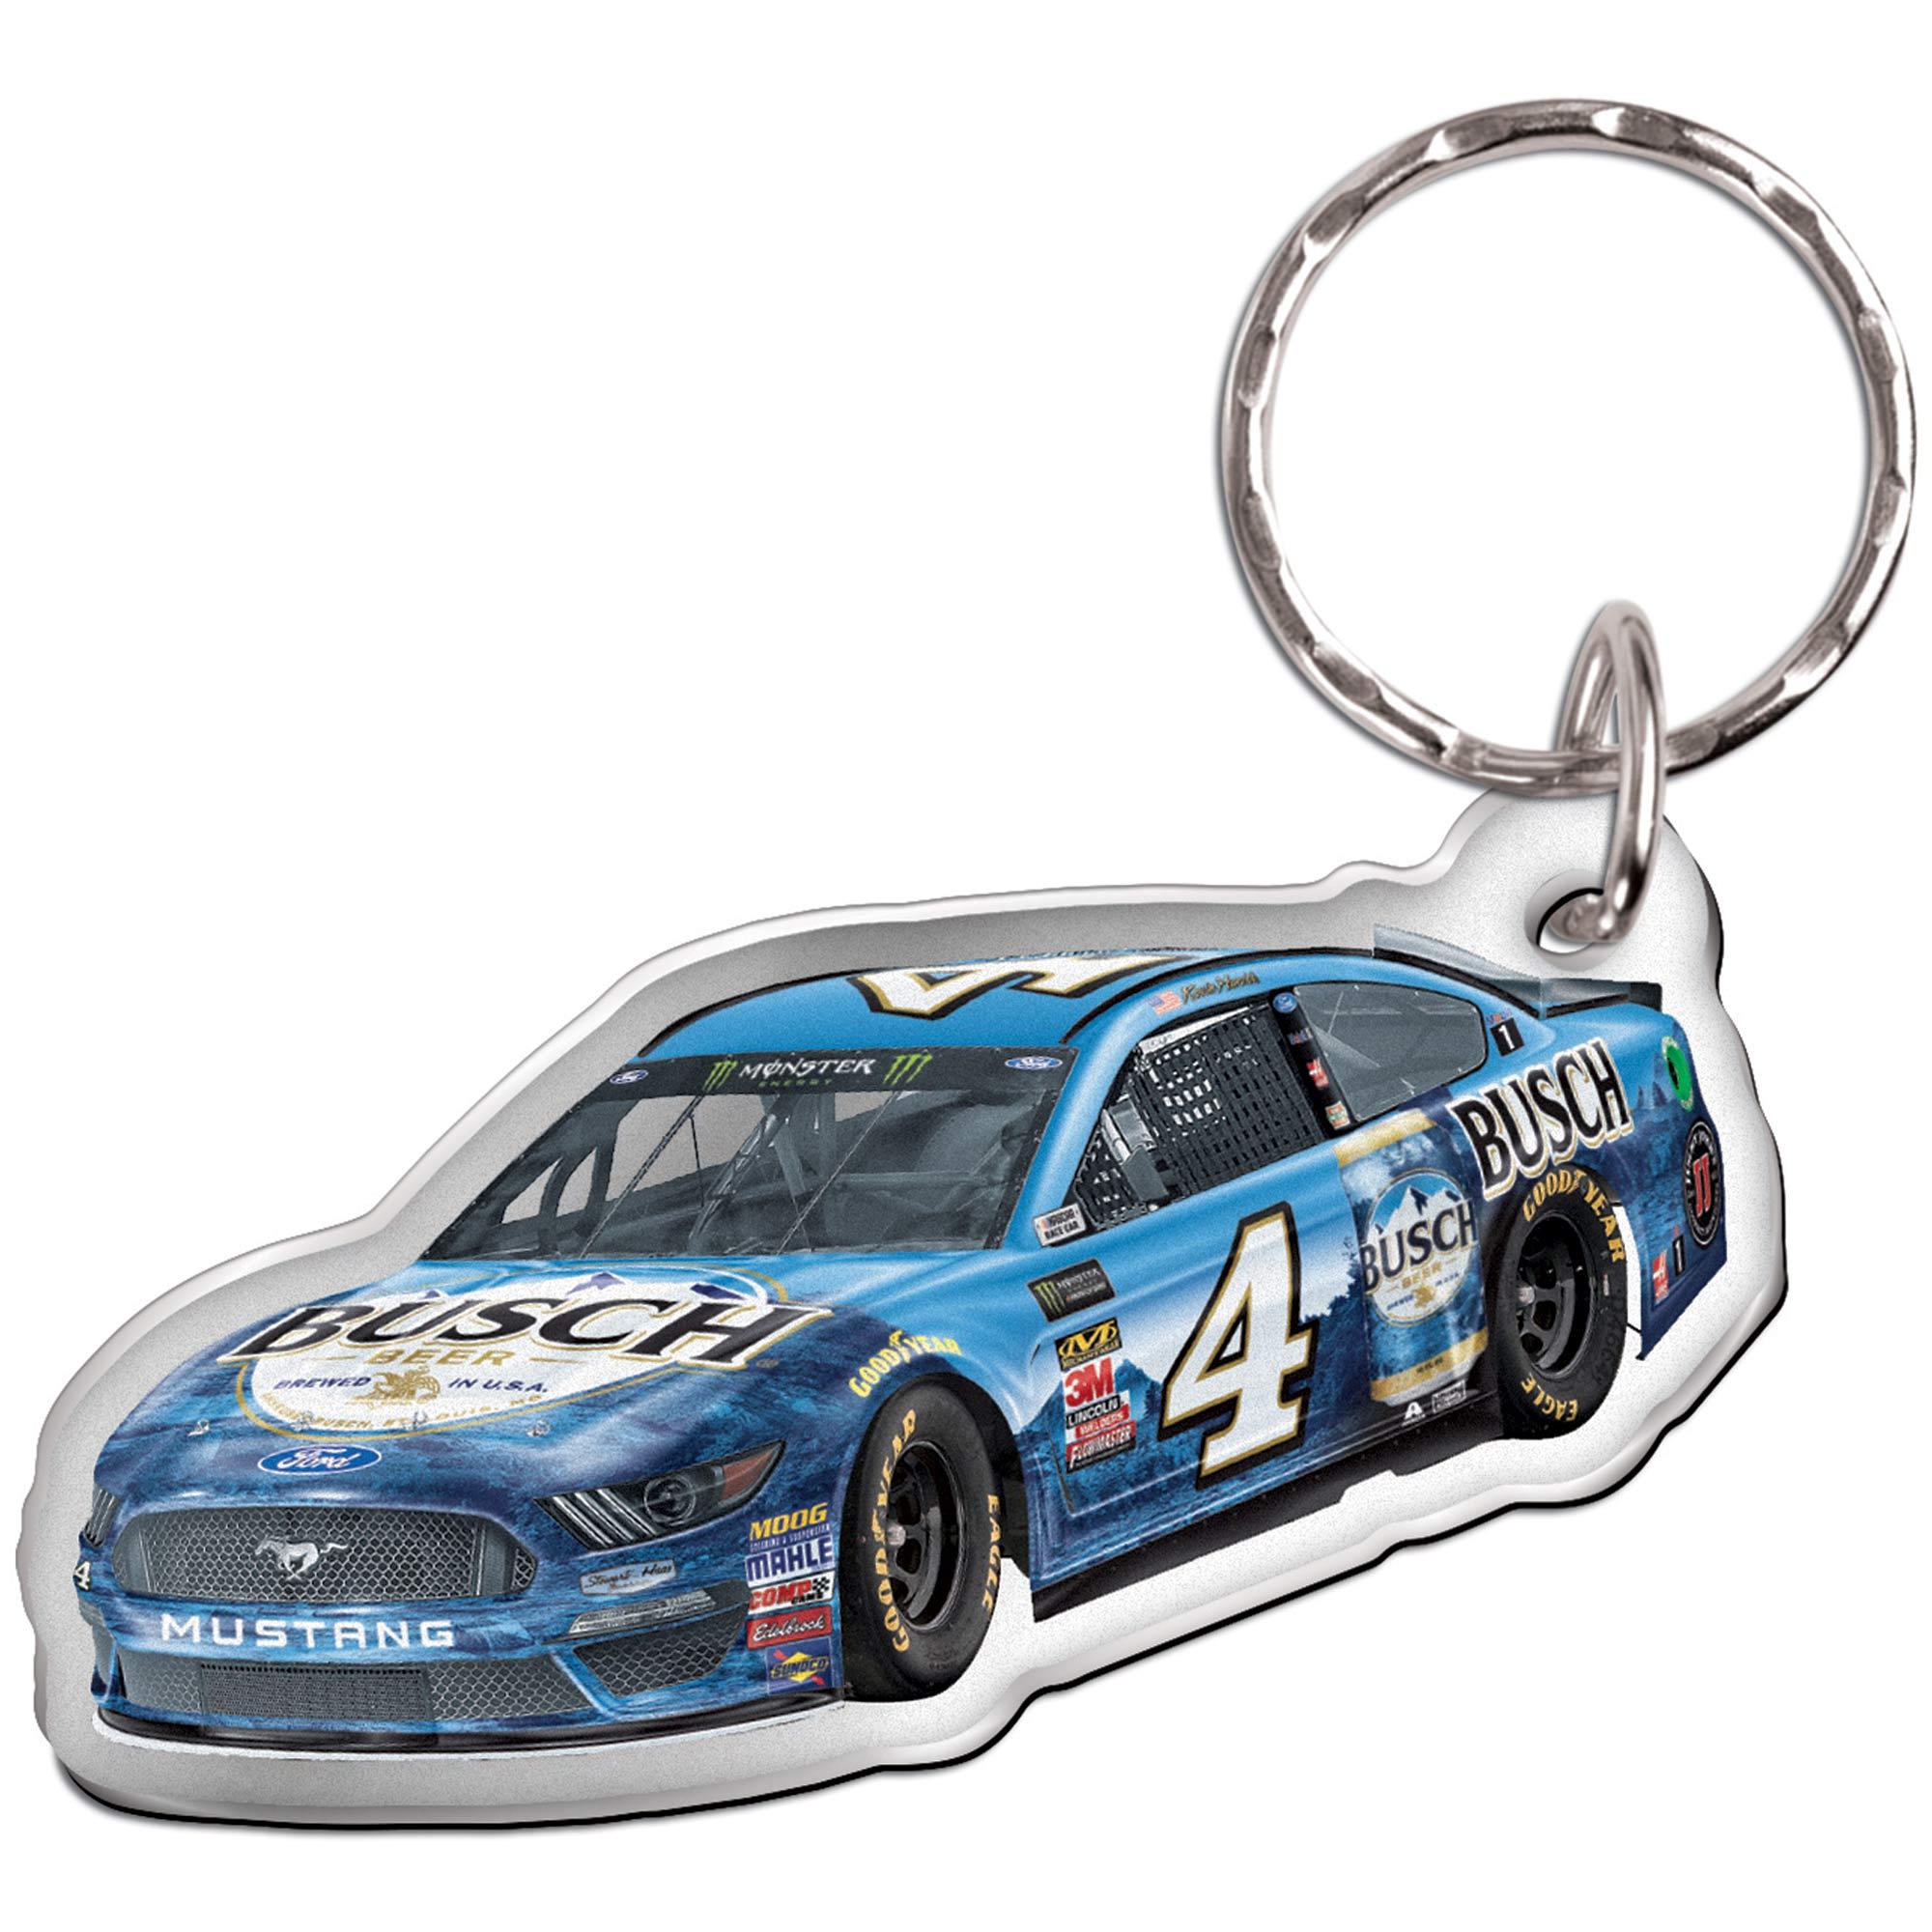 Kevin Harvick WinCraft Metallic Car Shape Key Ring - No Size